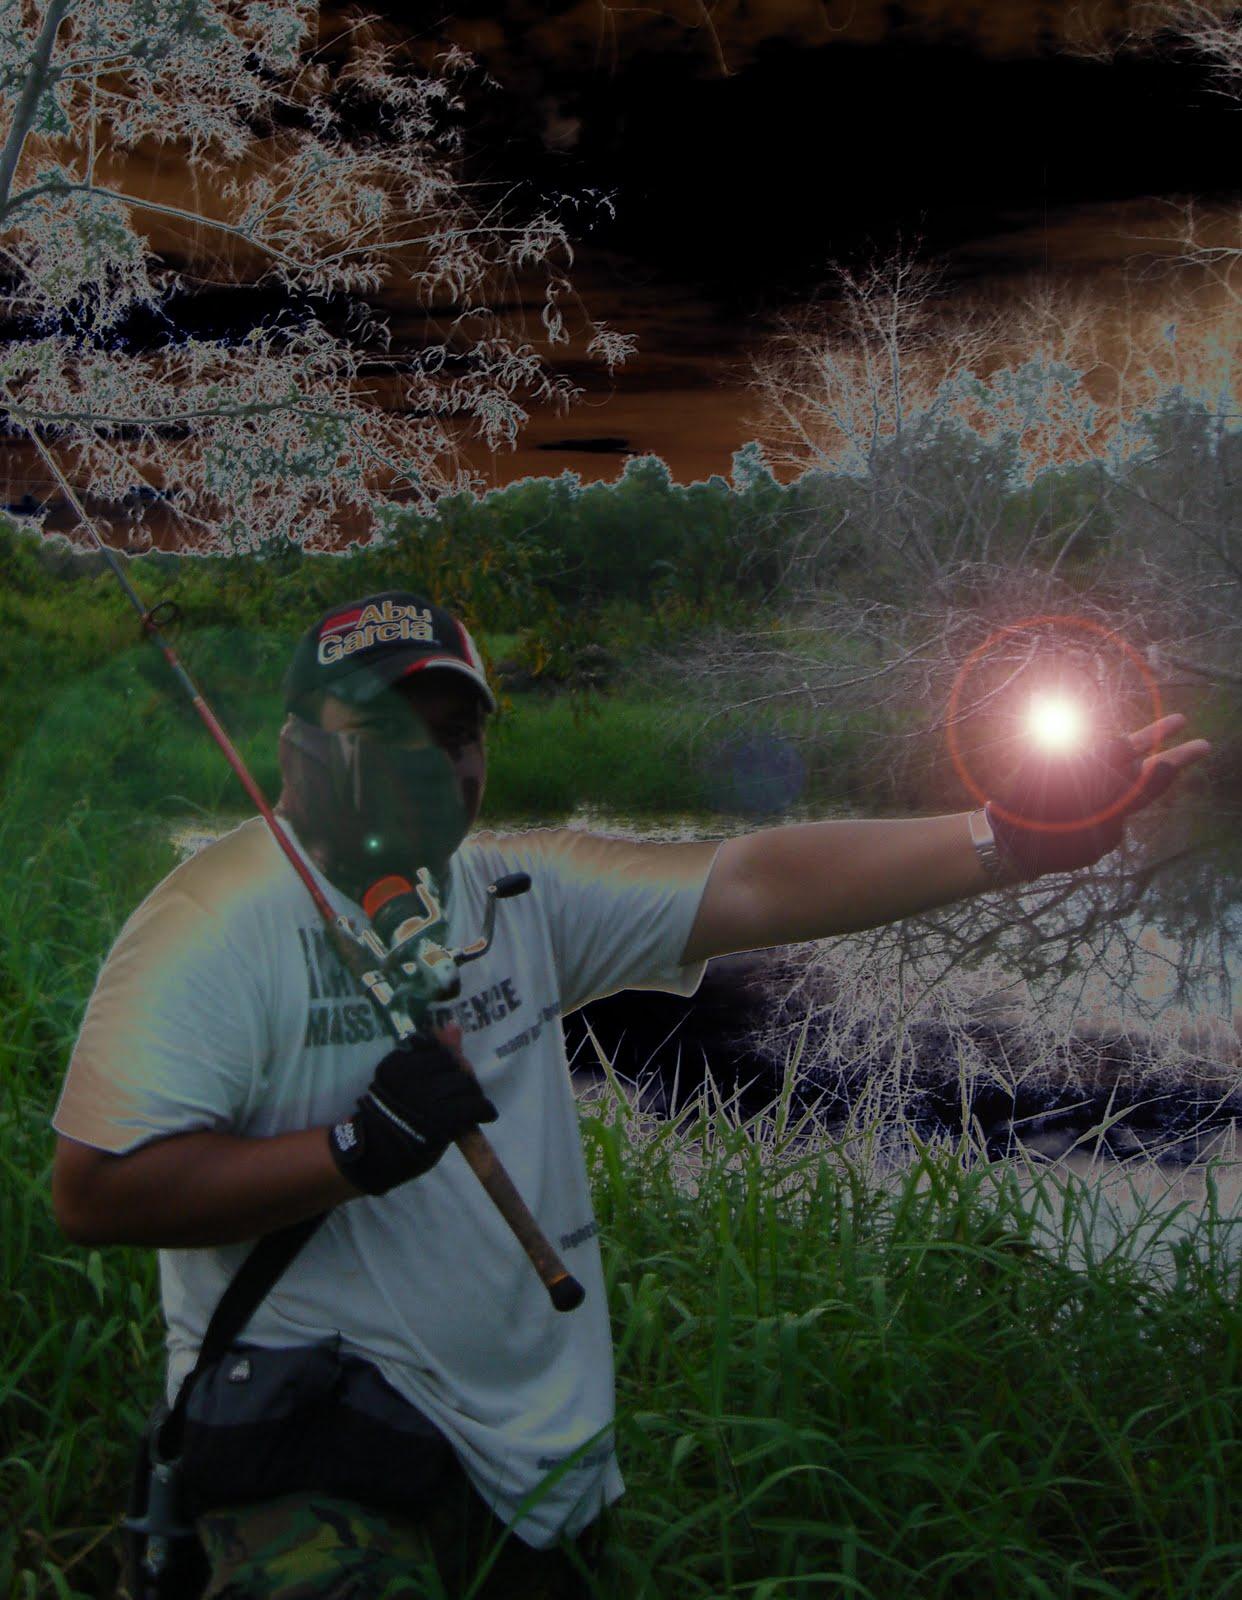 DARK ART CASTER ...The Malaysia amateur snakehead hunter ...